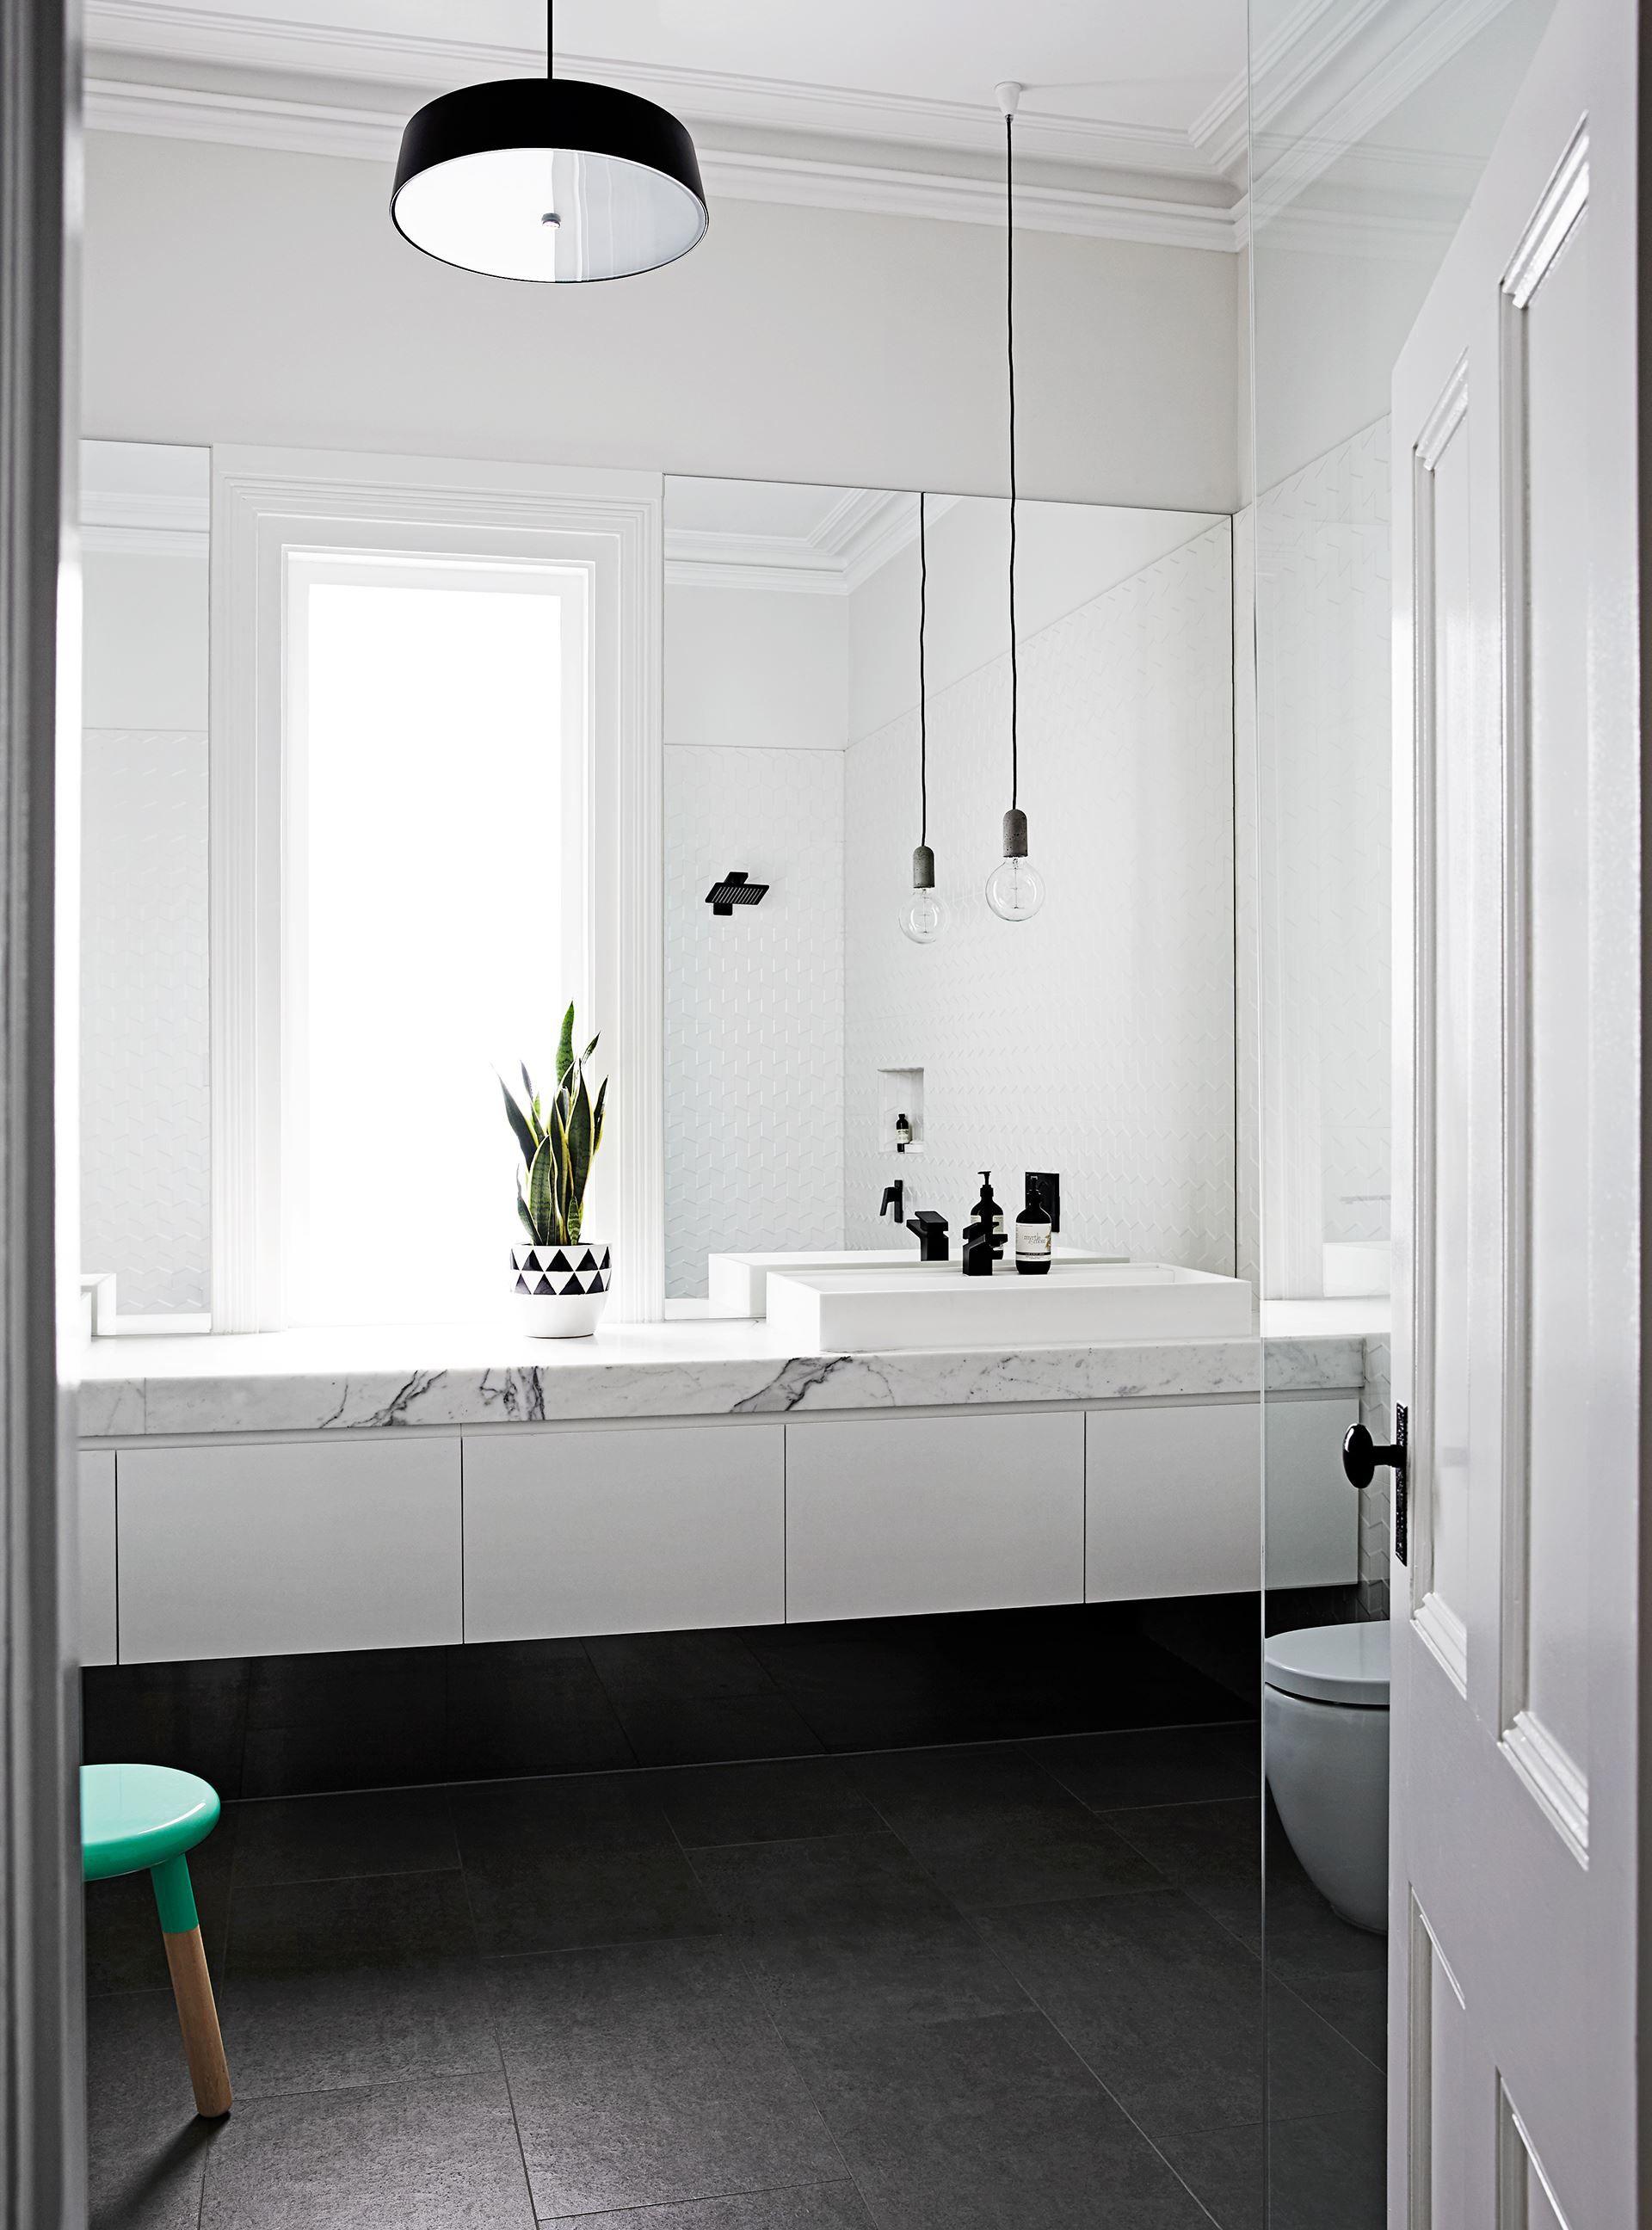 Homestory bathroom goals white elegant chic bathroom for Inspiration badgestaltung